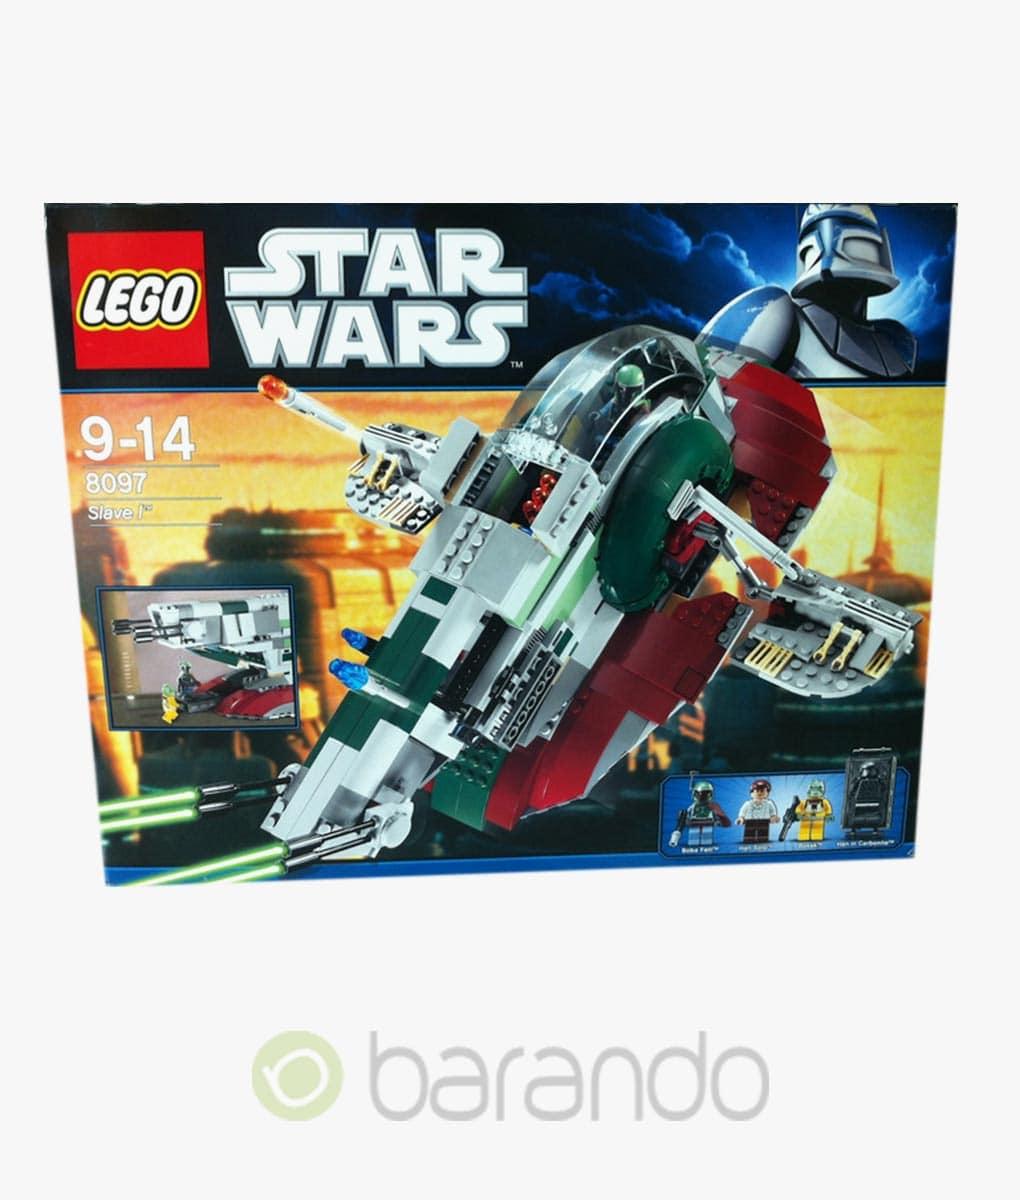 LEGO Star Wars 8097 Slave I Set